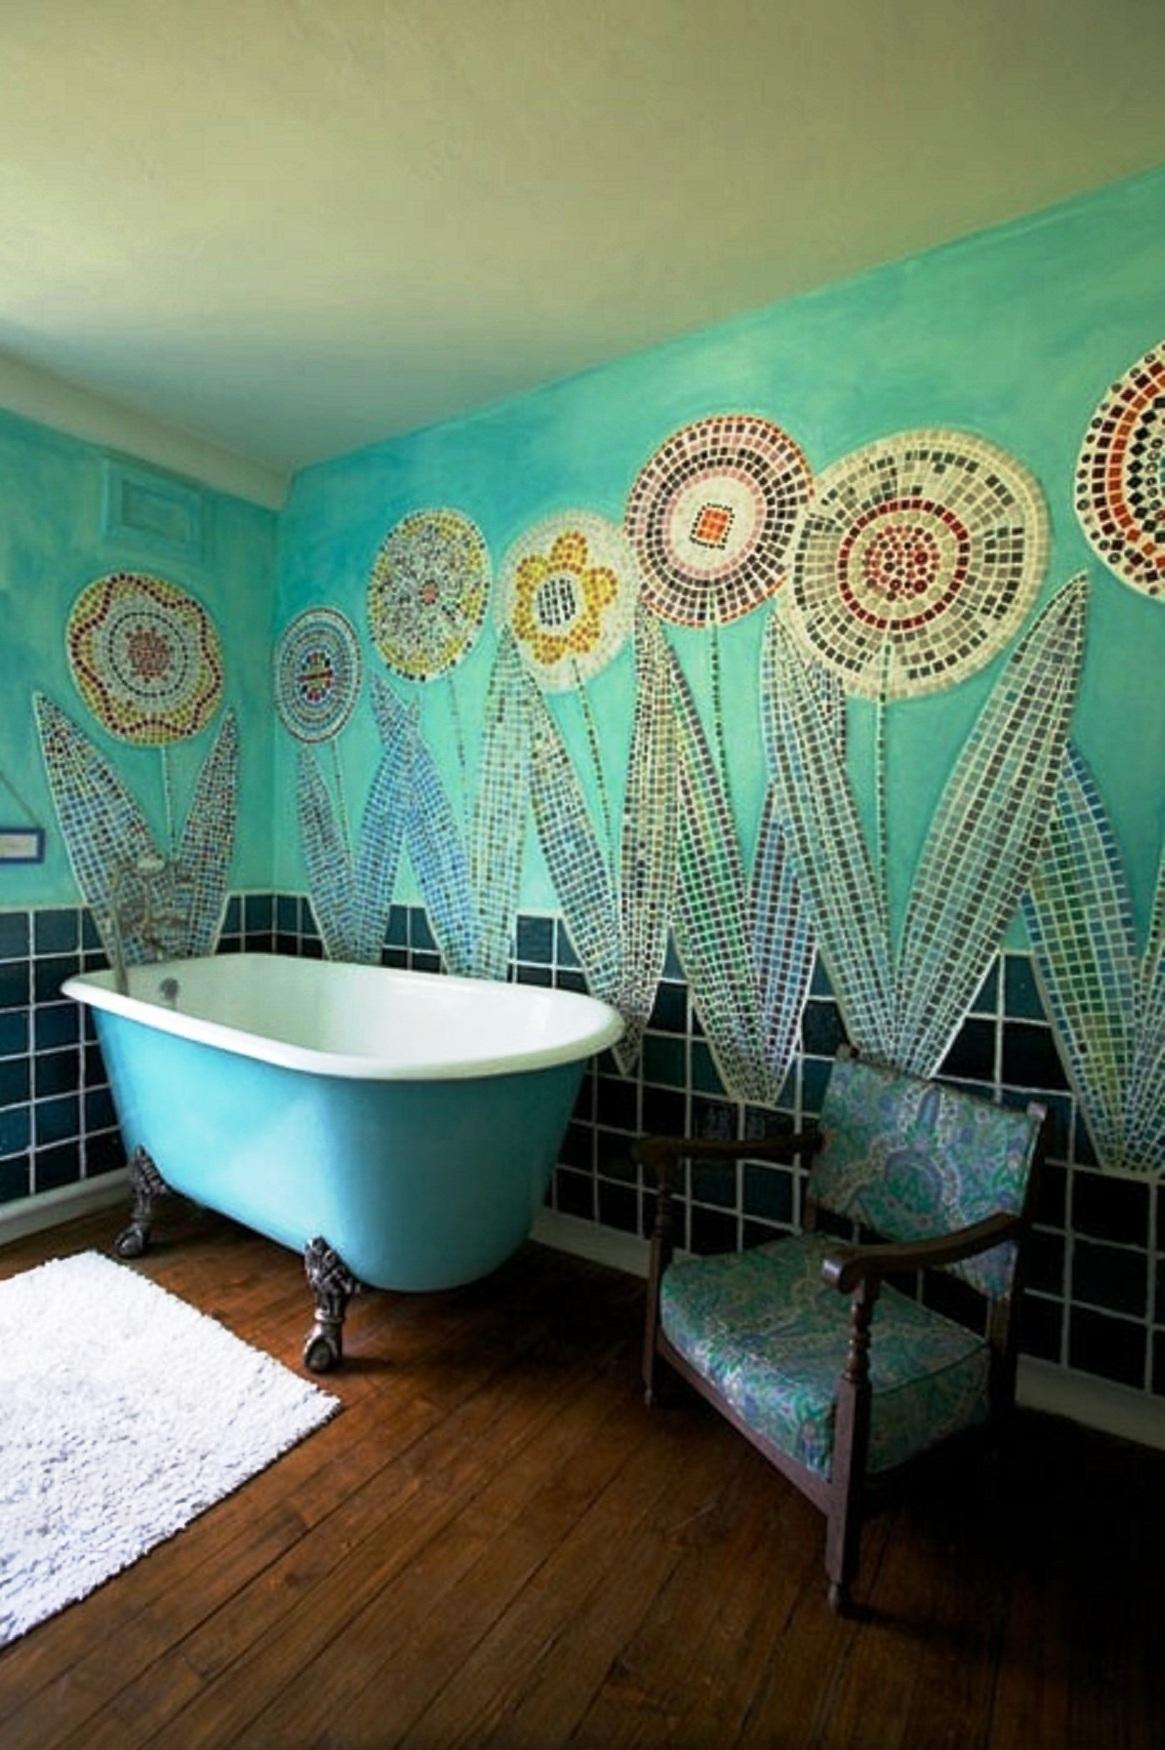 25 Awesome Bohemian Bathroom Design Inspirations